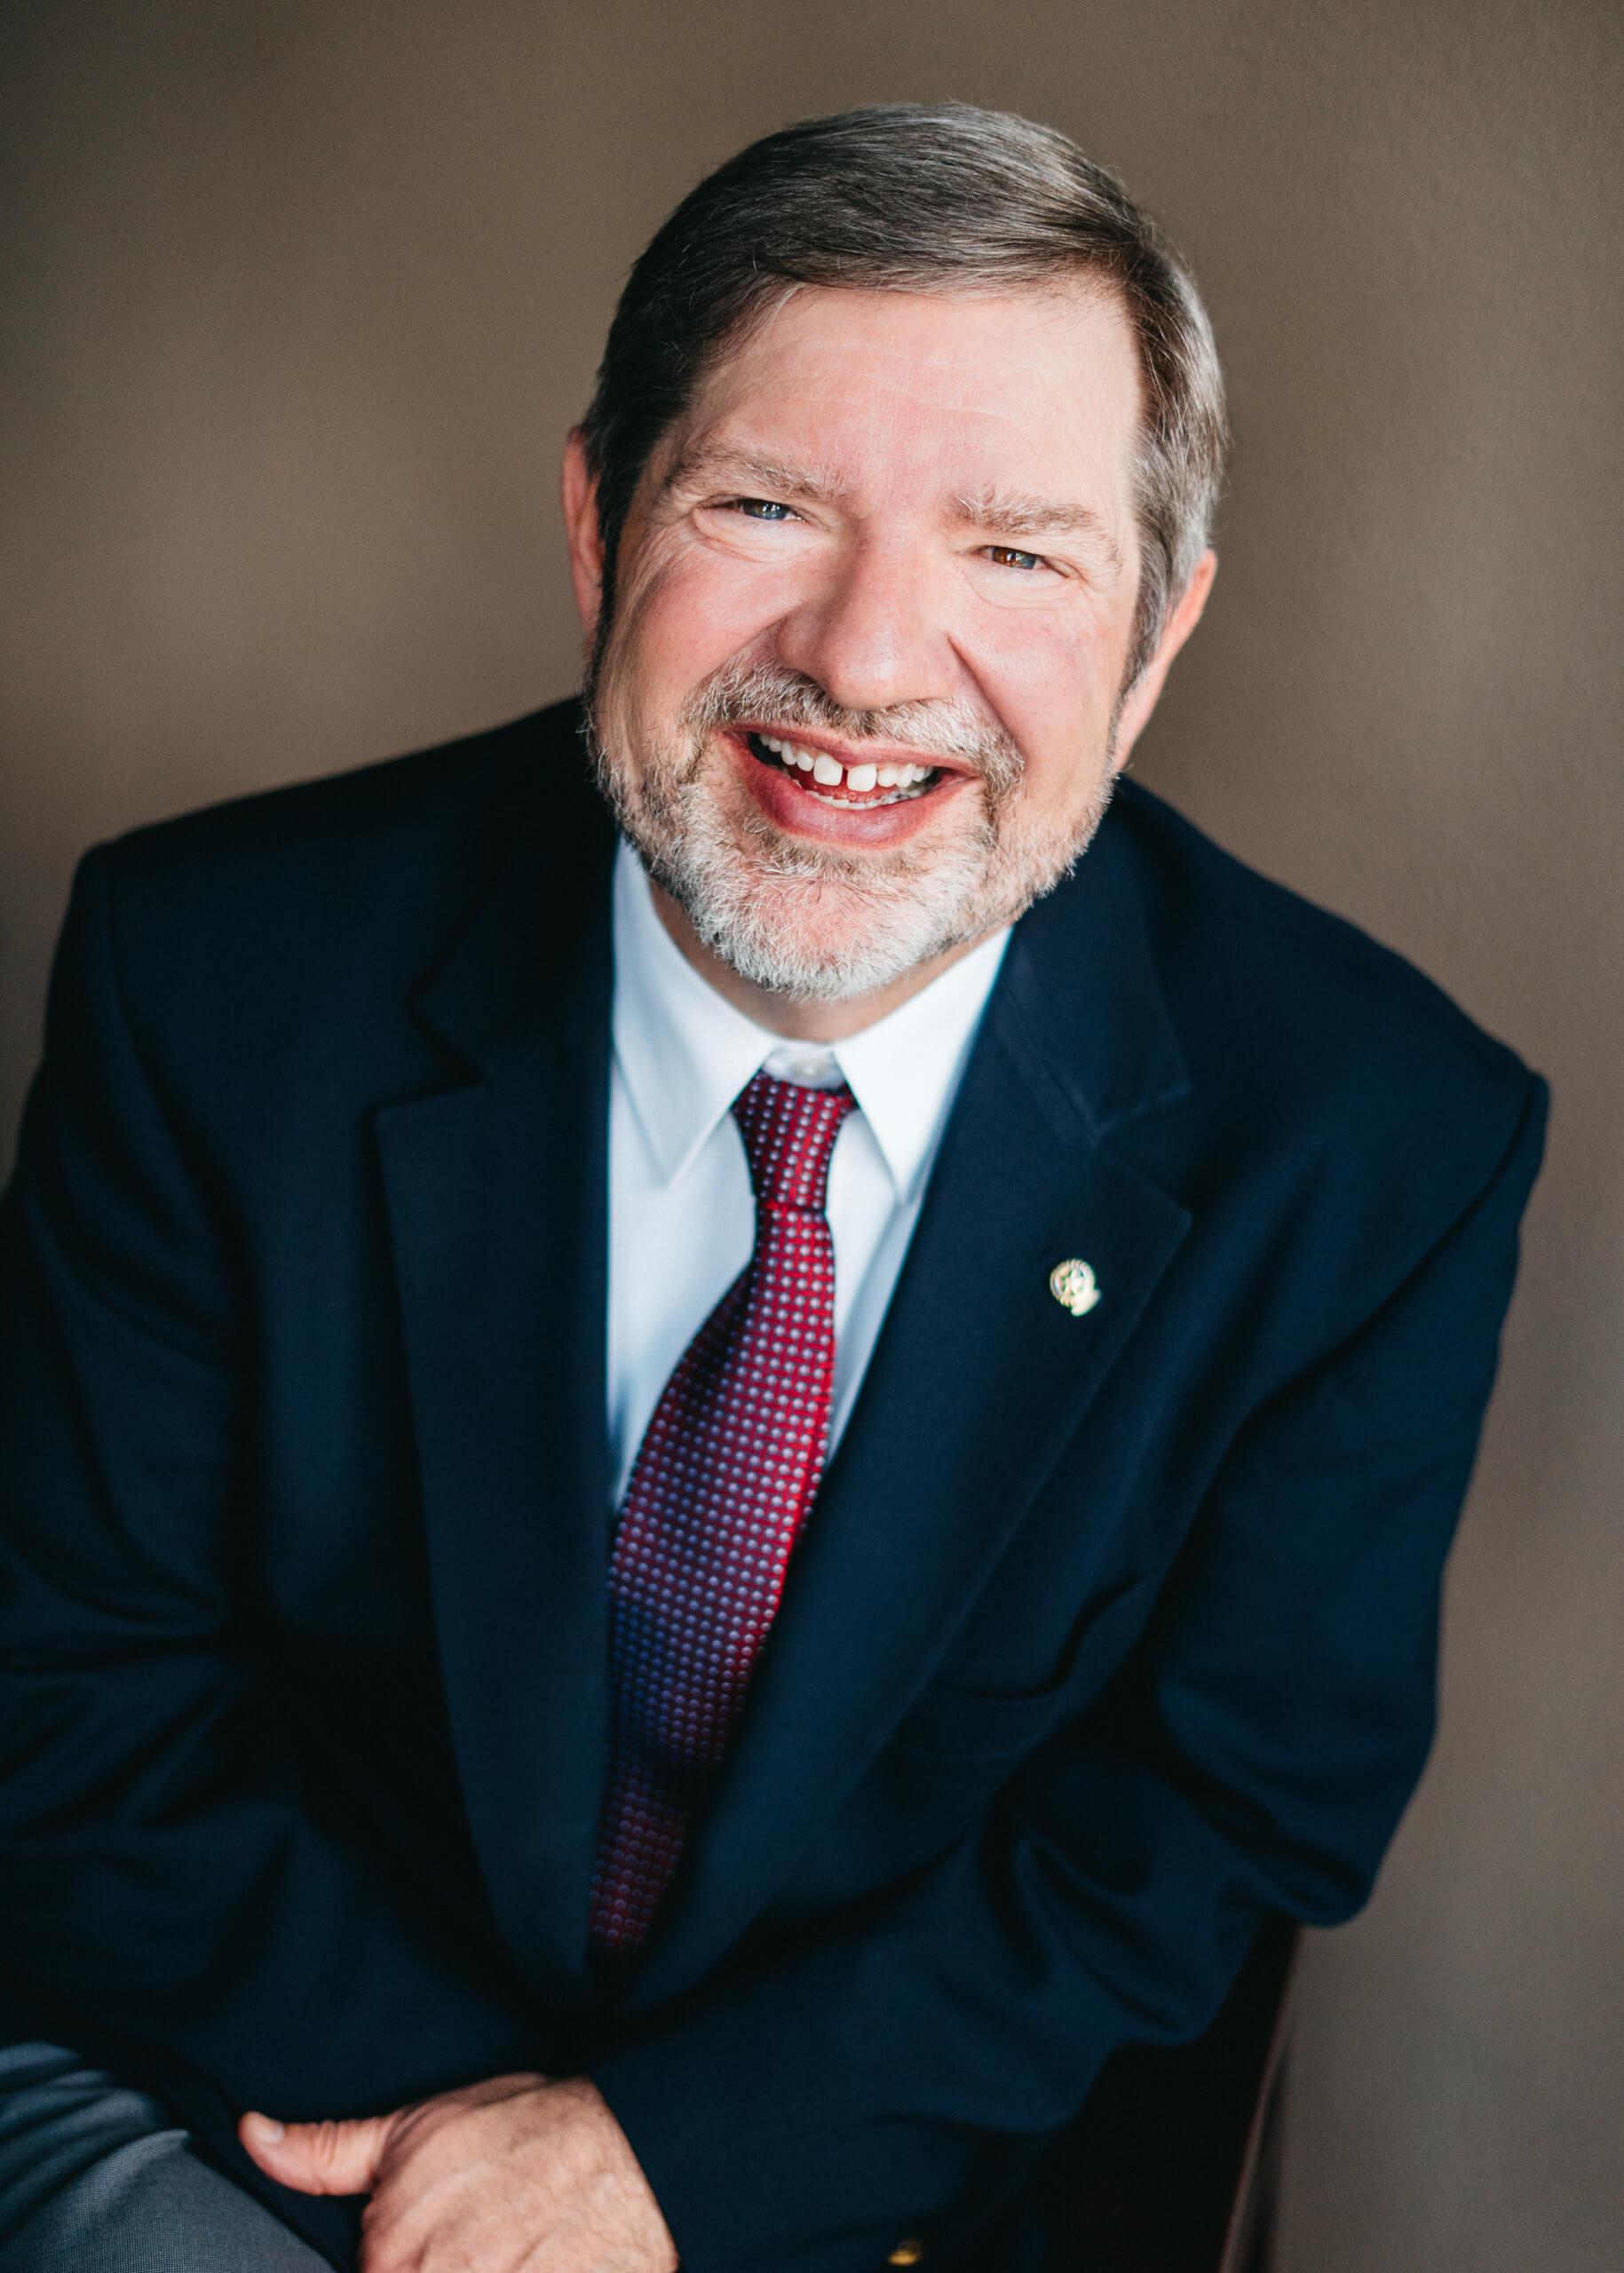 Brian K. Stallcop, CFP - Sherpa Wealth Strategies